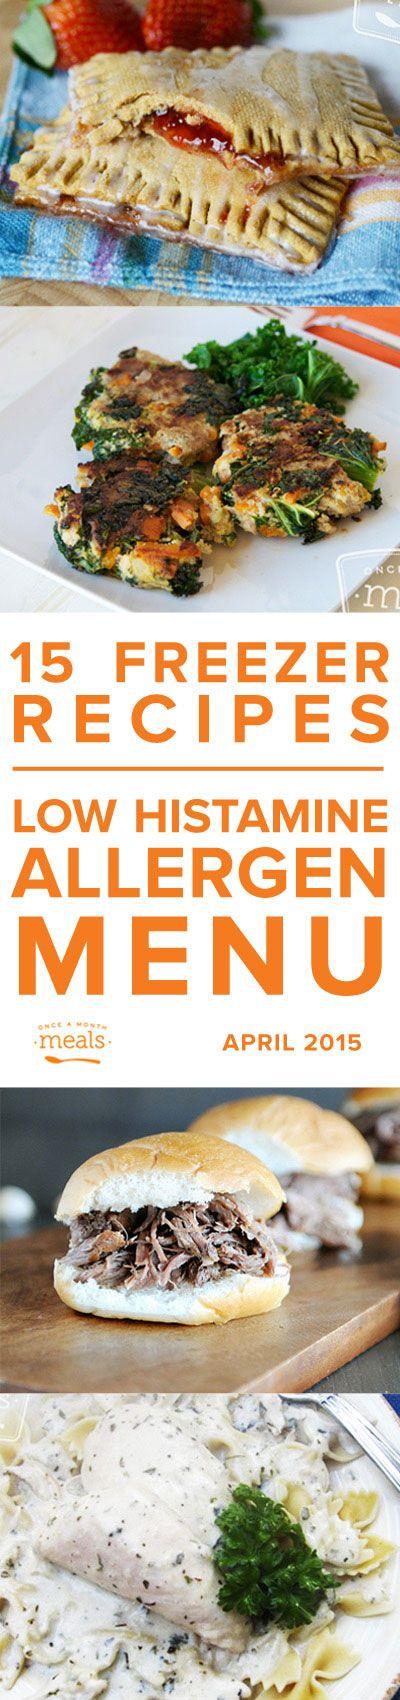 Low Histamine April Menu 2015   Once a Month Meals   OAMC   Freezer Meals   Freezer Cooking   Custom Menus   Menu Planning